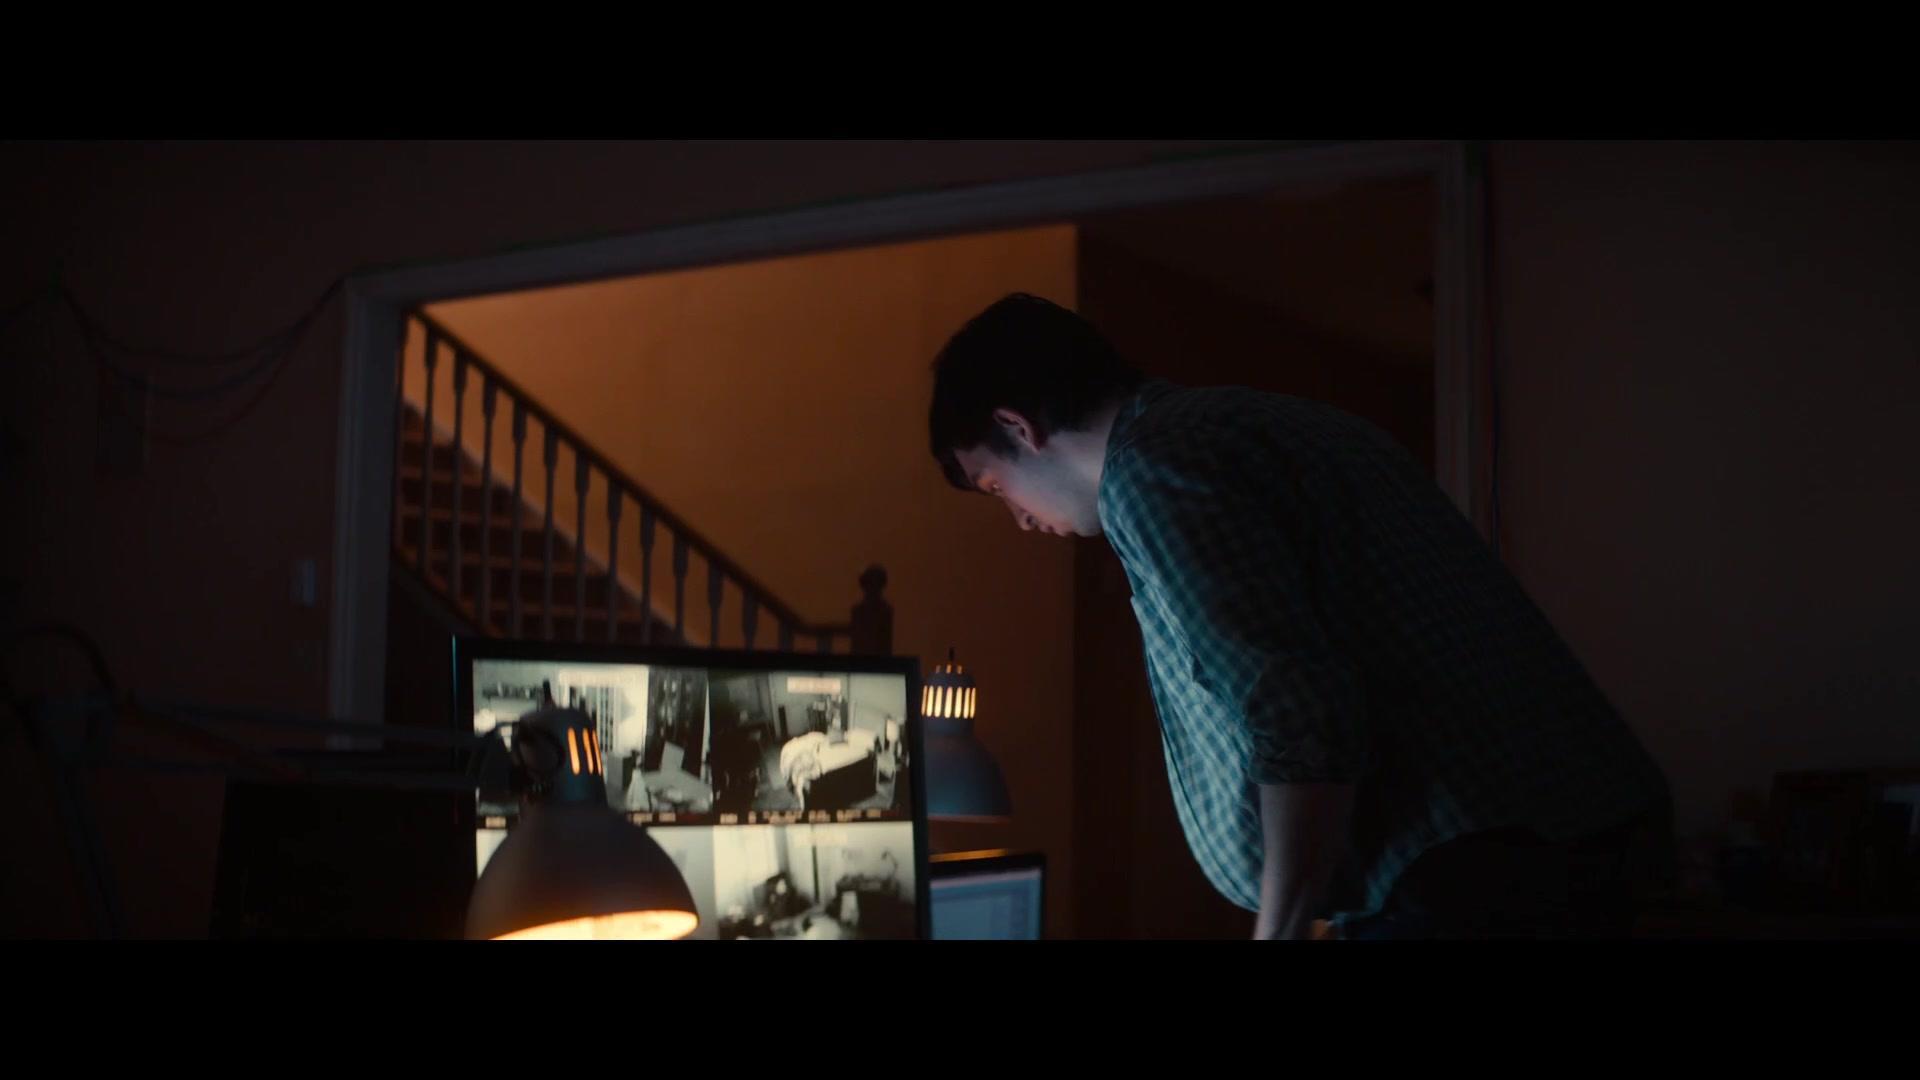 Poltergeist Juegos Diabolicos [2015][BD-Rip][1080p][Lat-Cas-Ing][Terror]